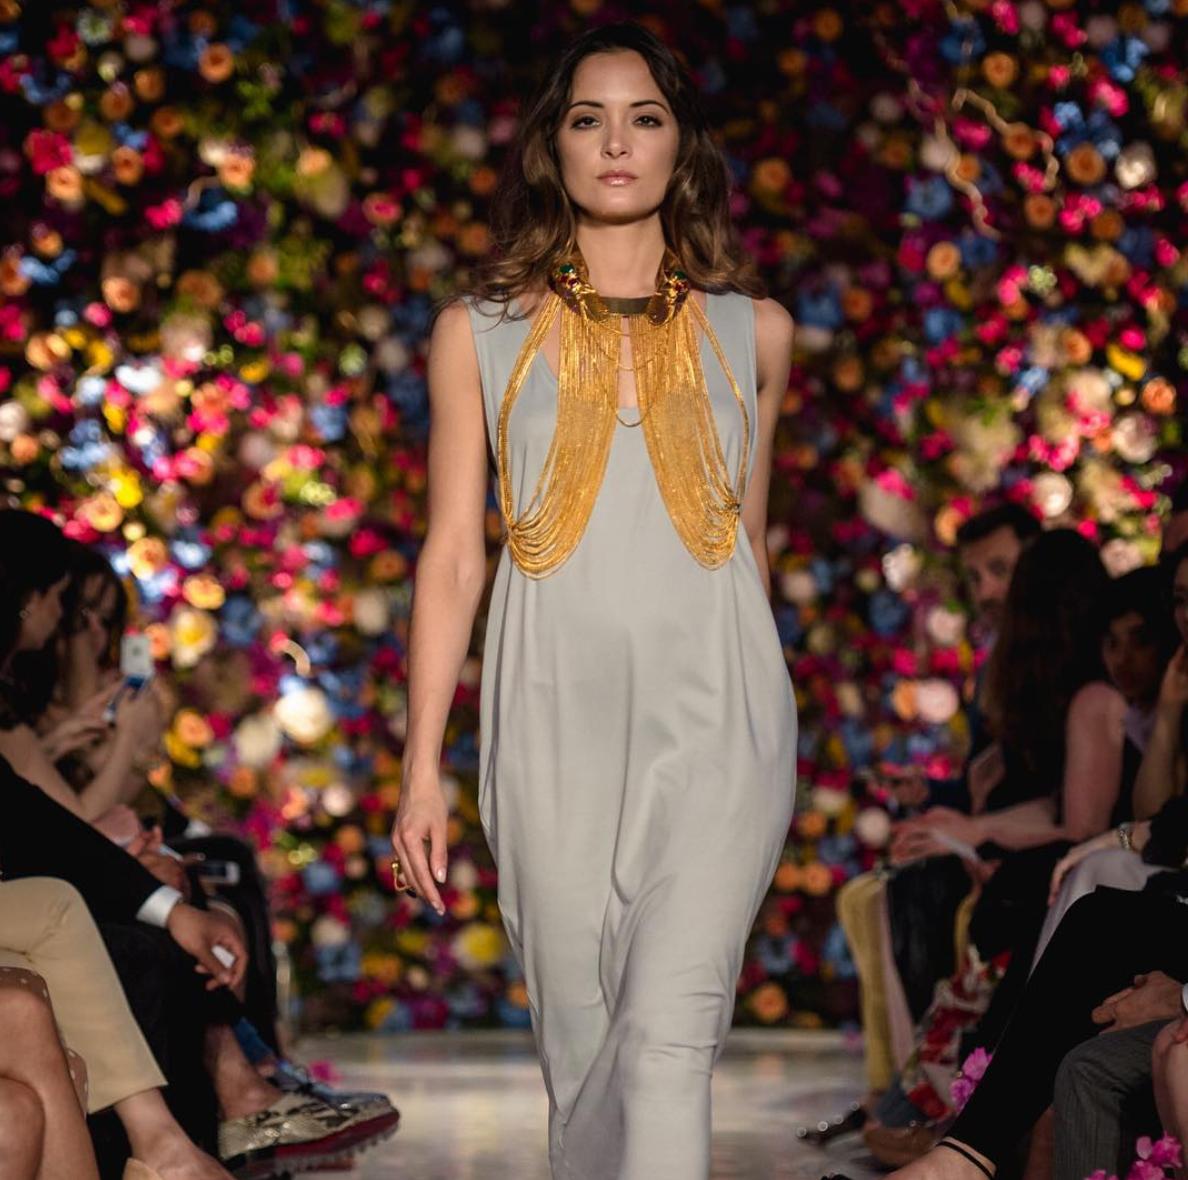 Saatchi Gallery Rema Jewellery Isabel Wong Dress.jpg